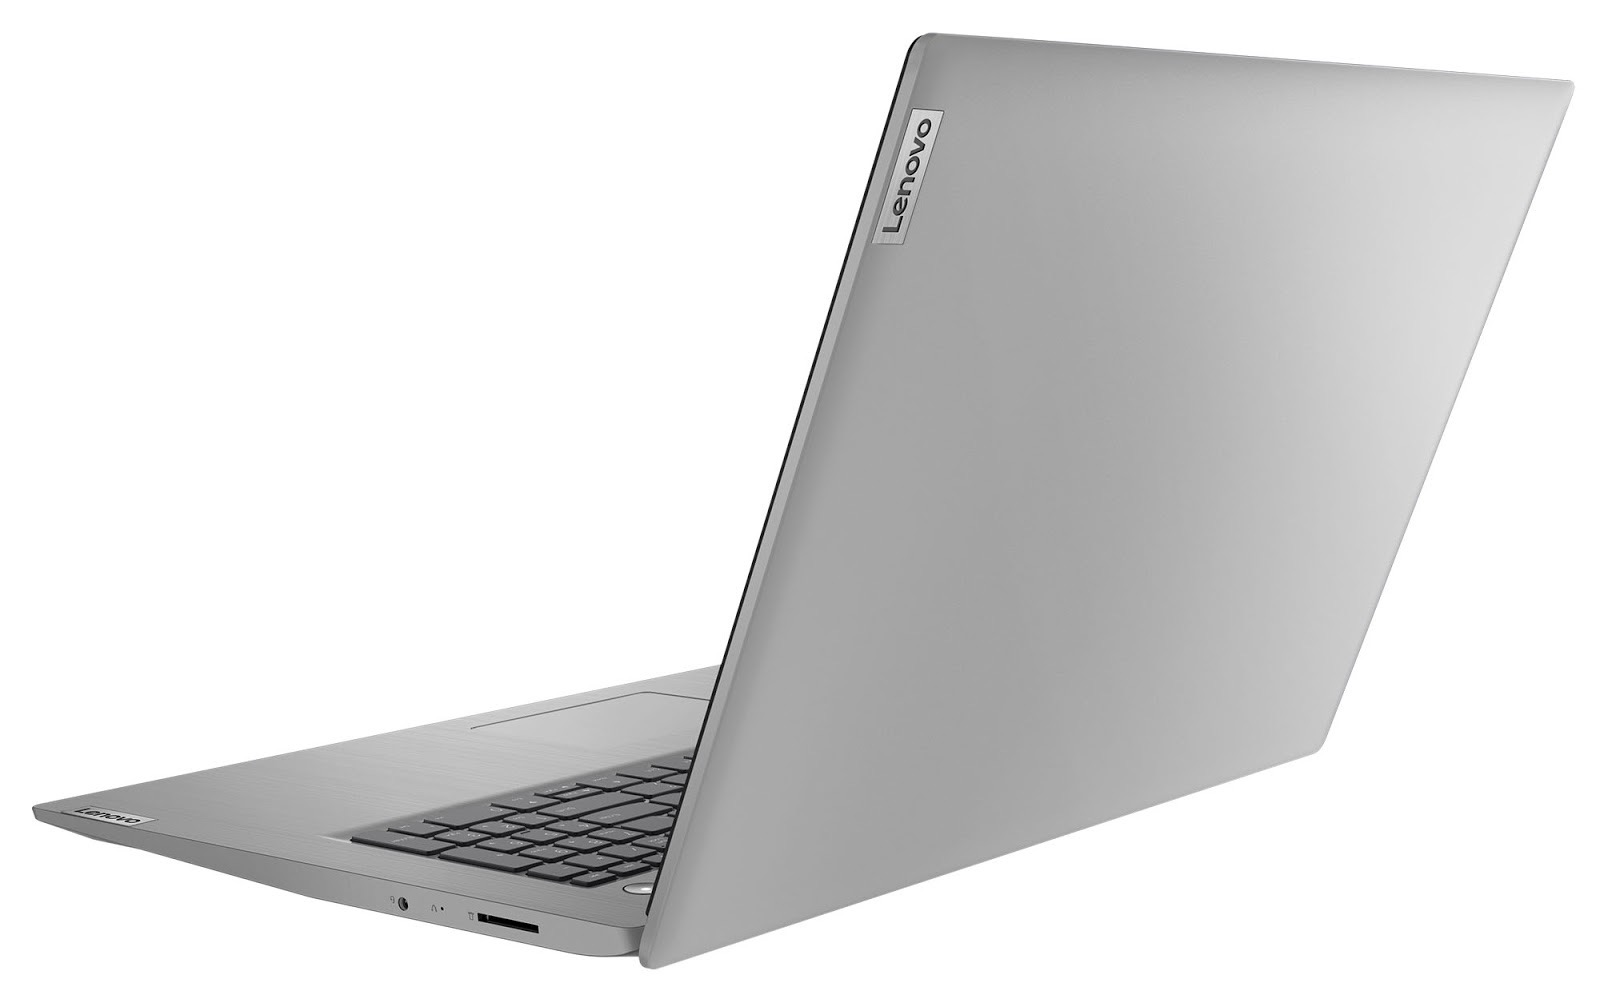 Фото 1. Ноутбук Lenovo ideapad 3 17IML05 Platinum Grey (81WC003CRE)